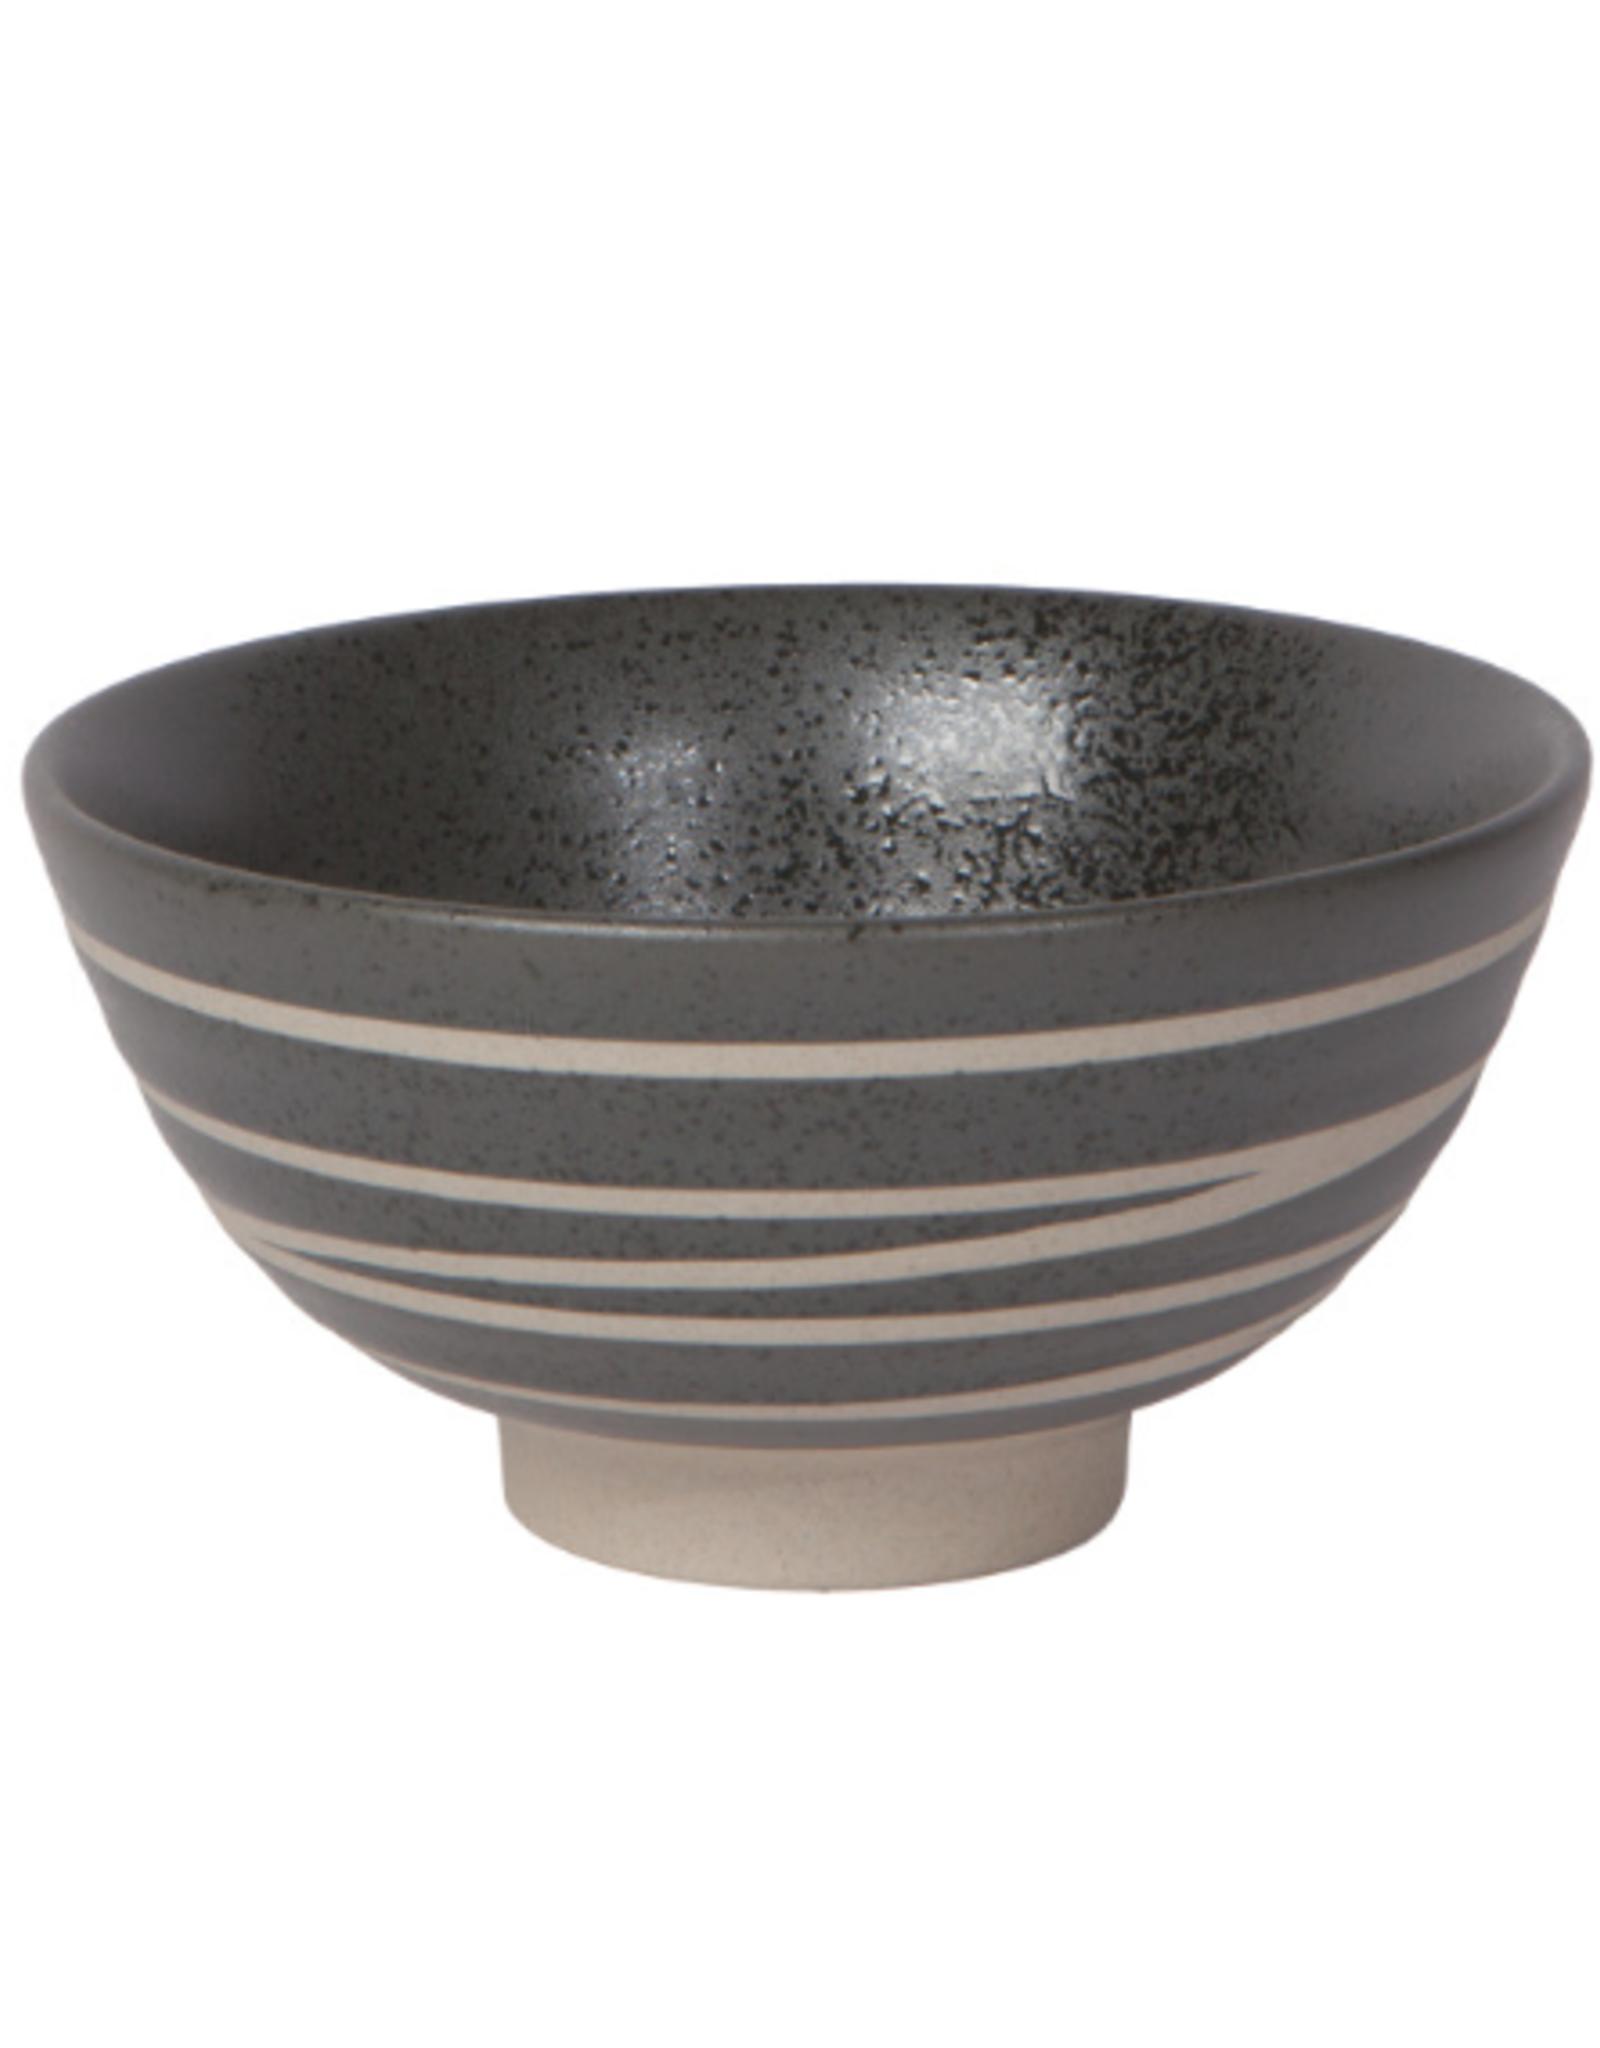 "Now Designs Bowl, Element 6"" Rhythm"